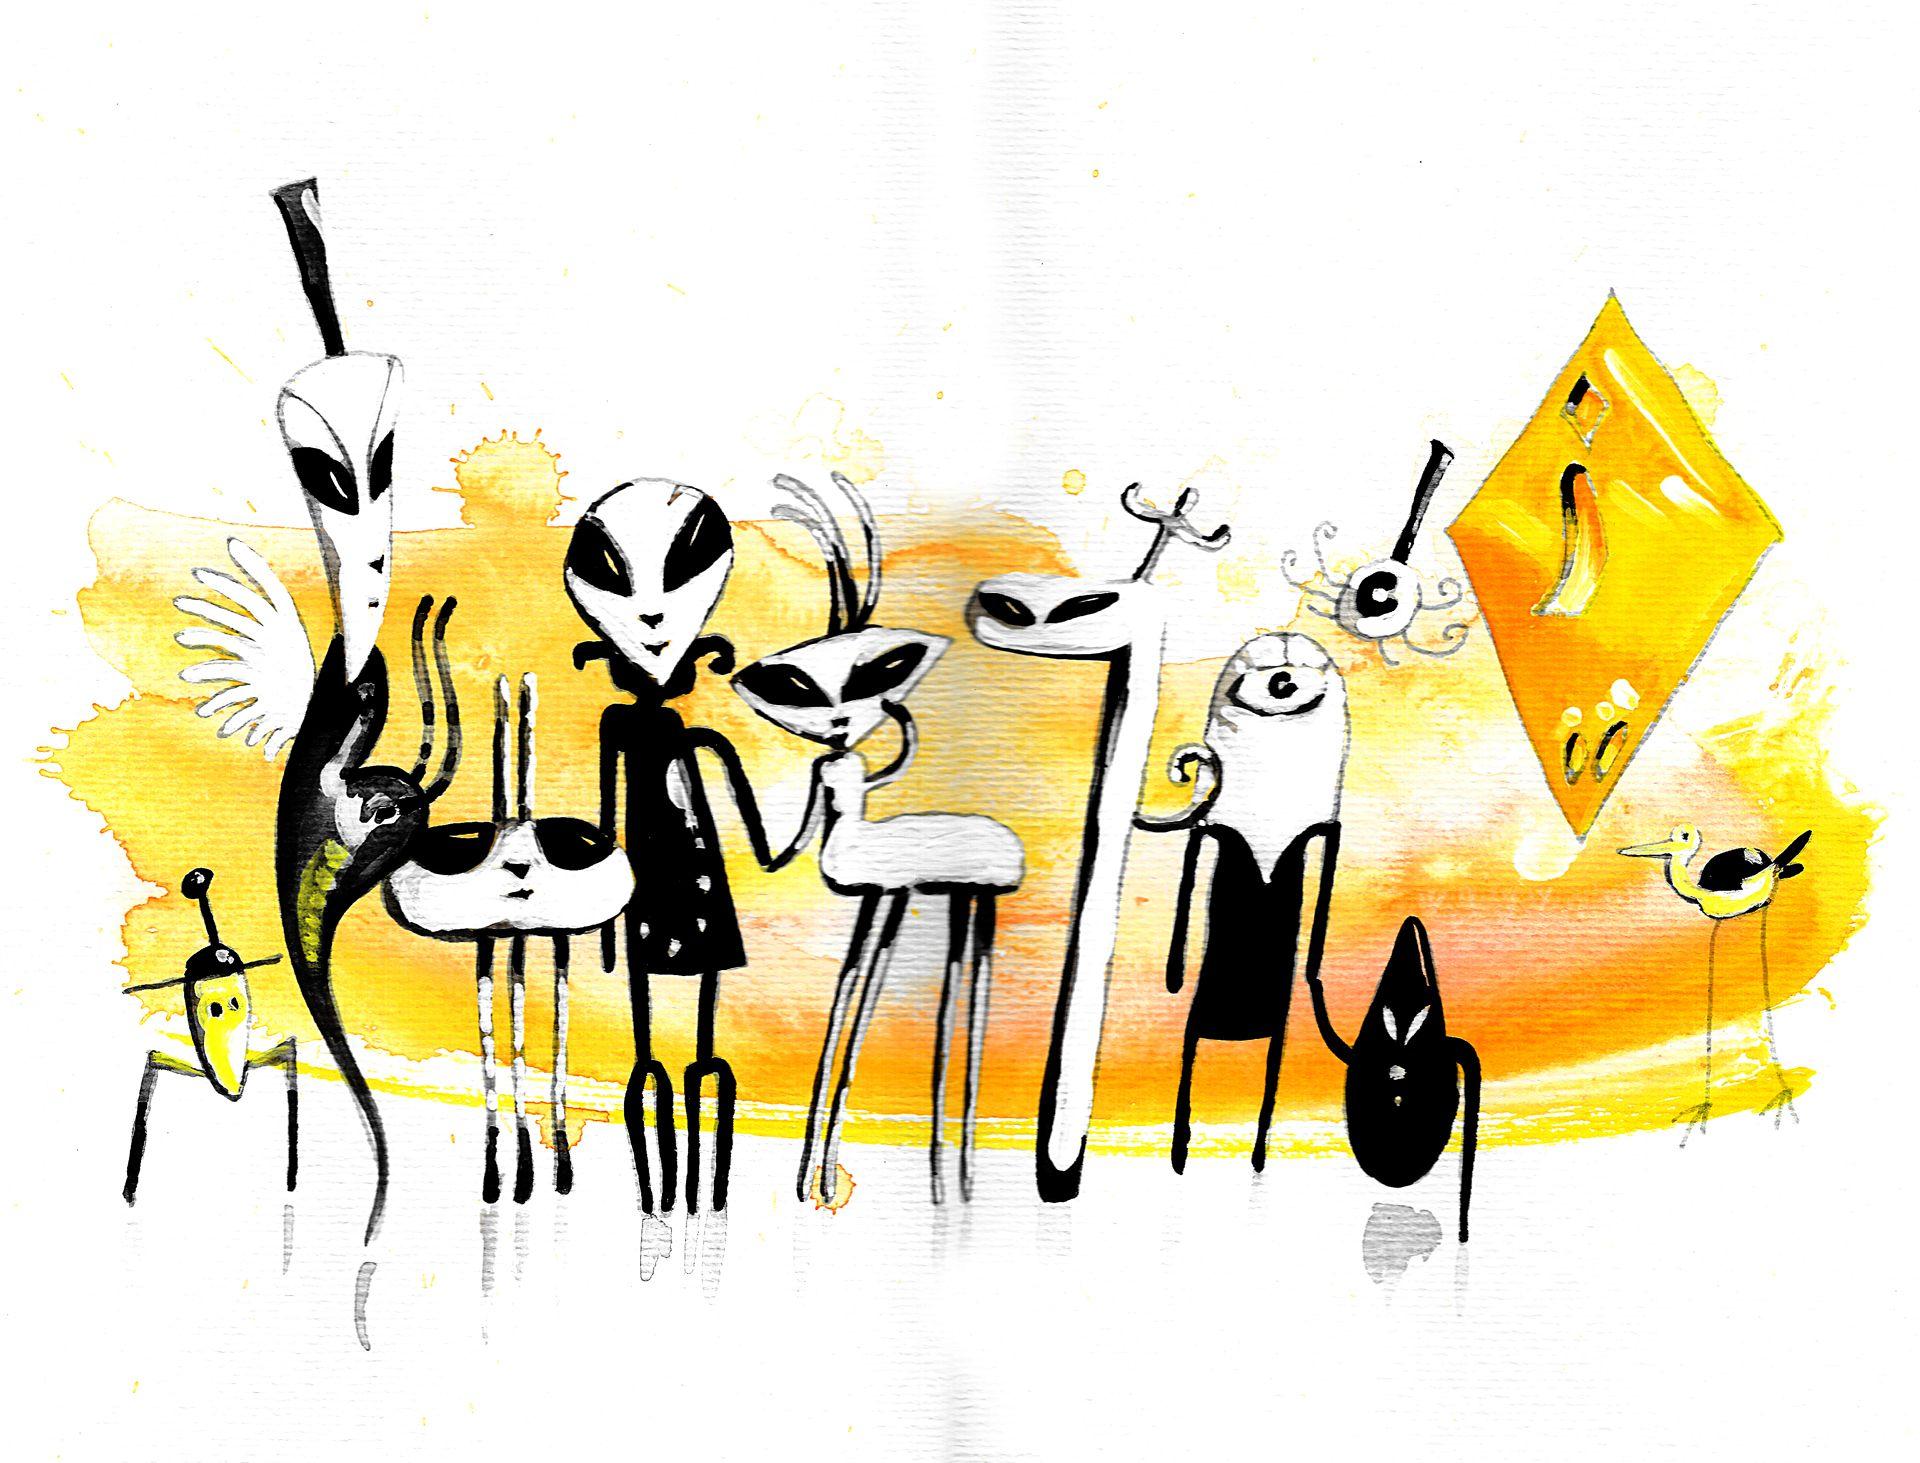 SNAPSHOTS LAST LONGER 06 - watercolor - 11x17inches